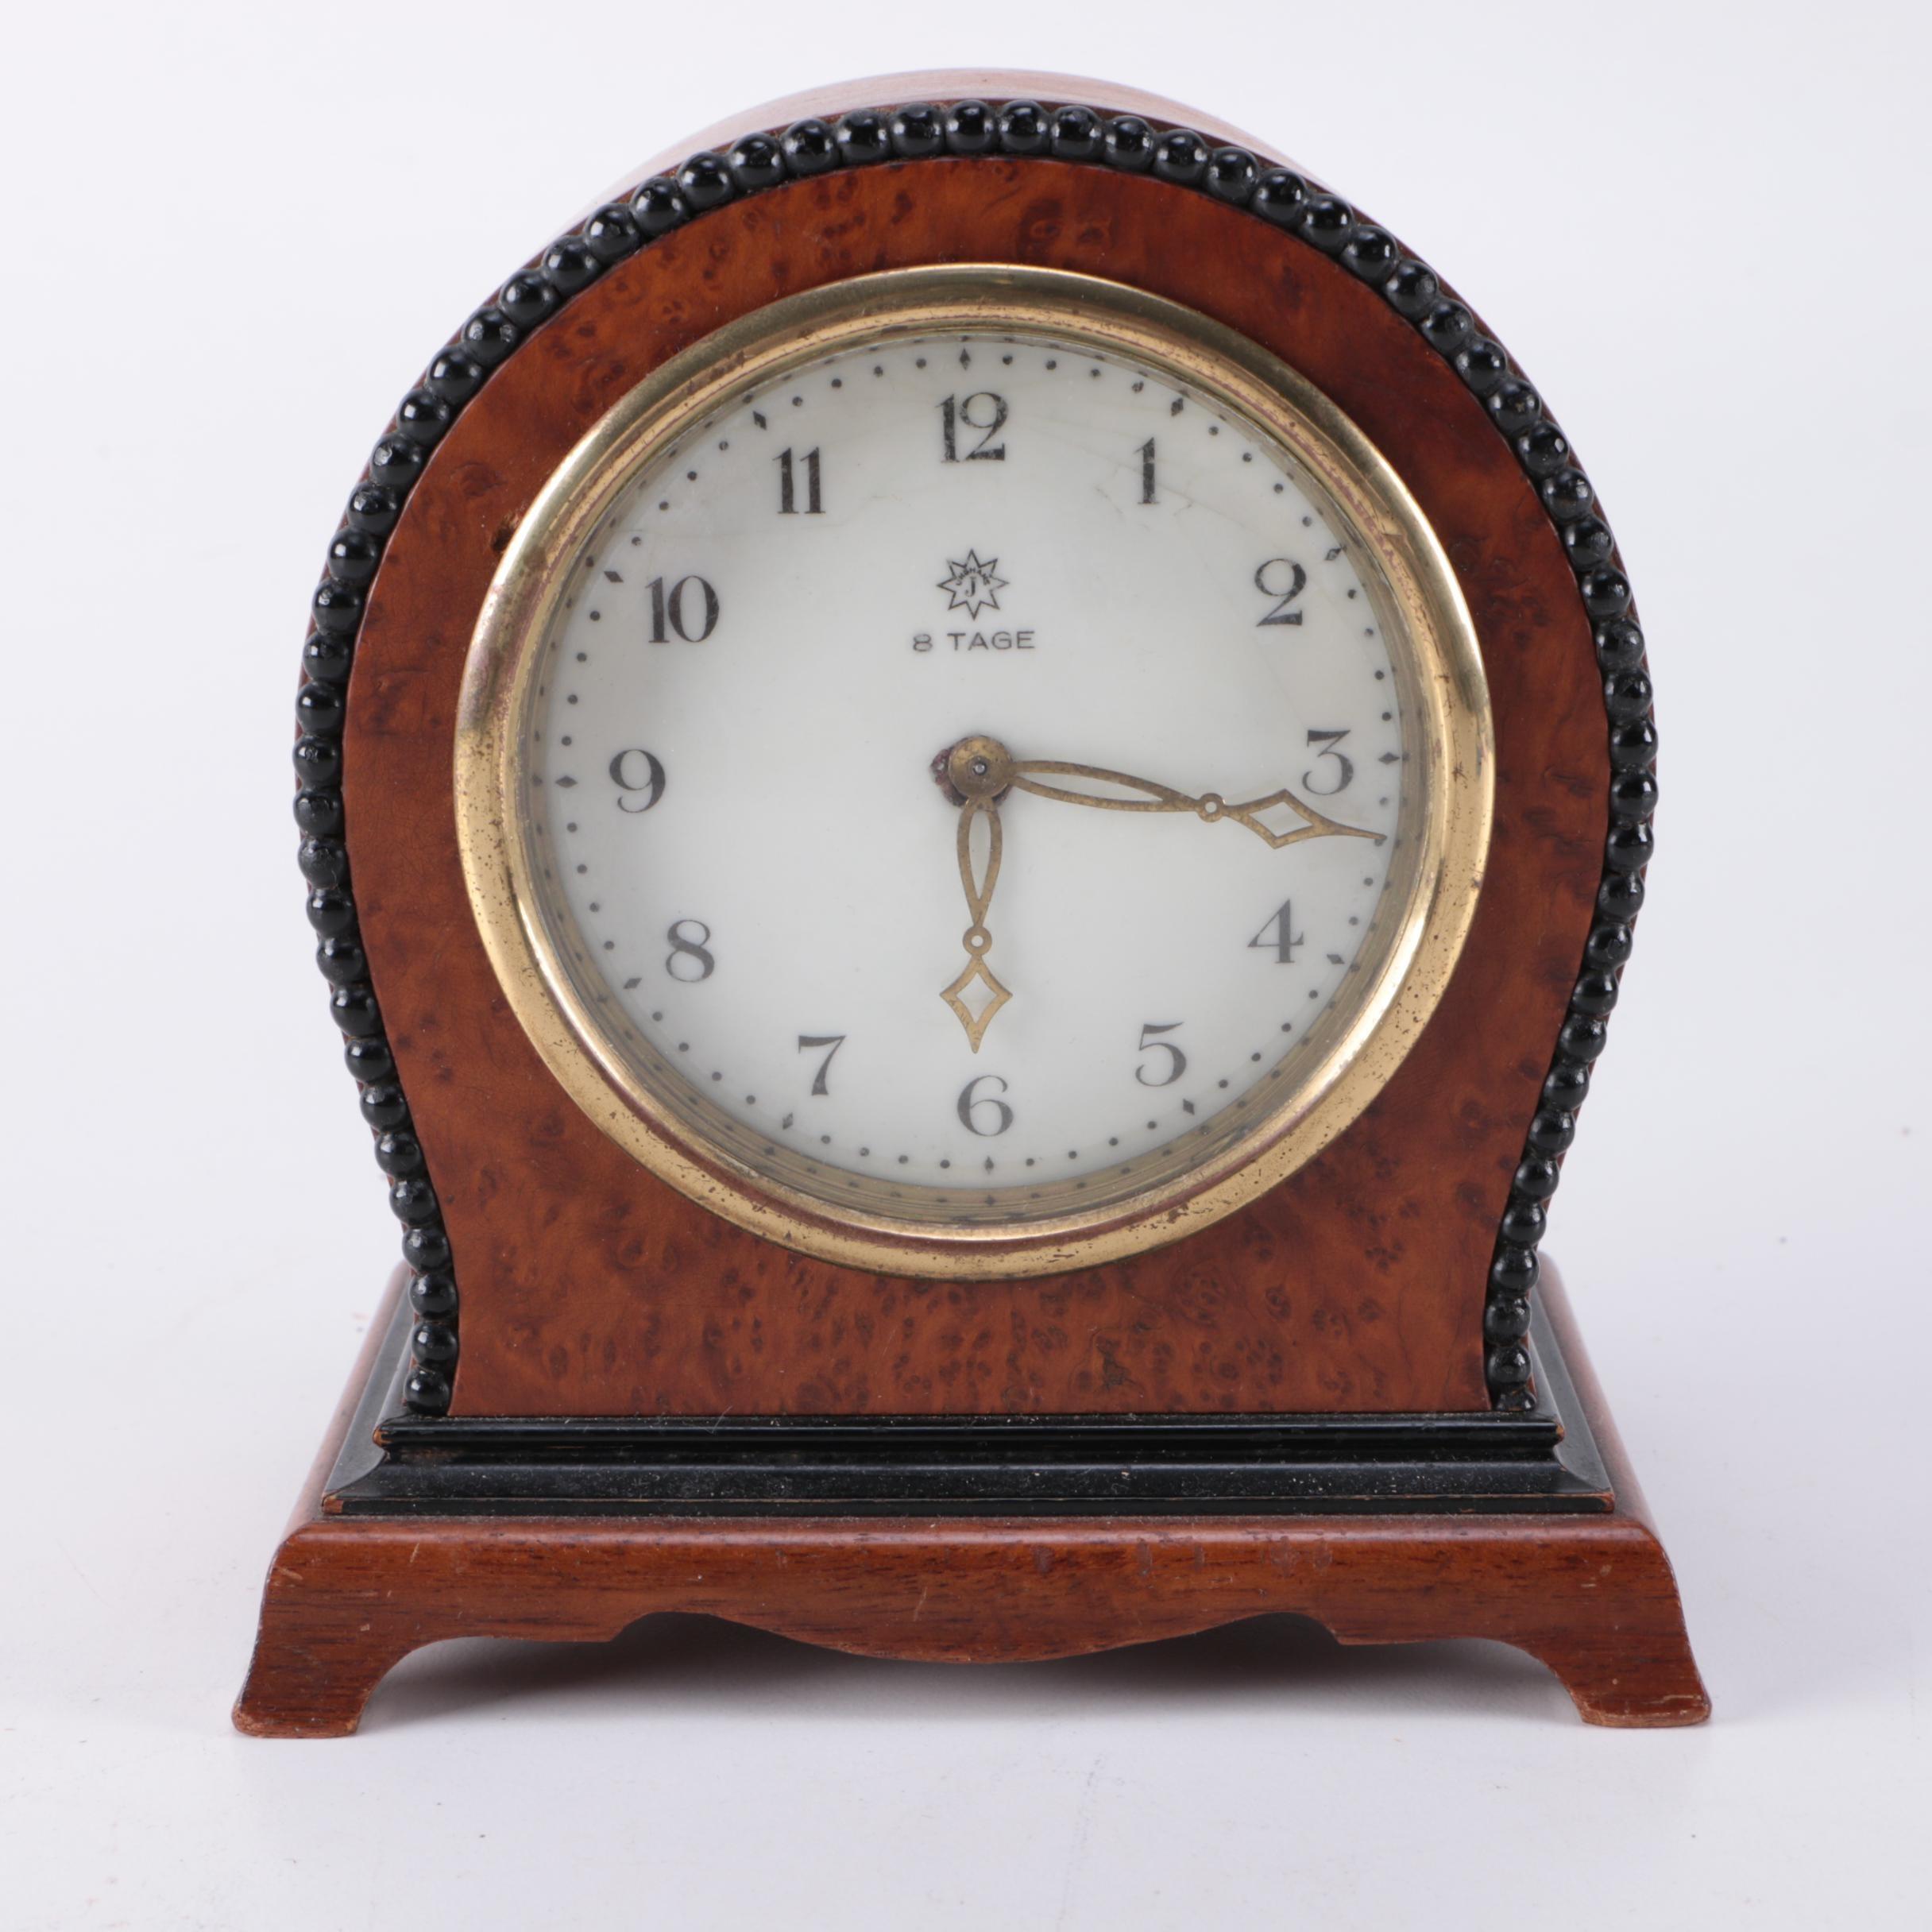 8-Tage Mantle Clock